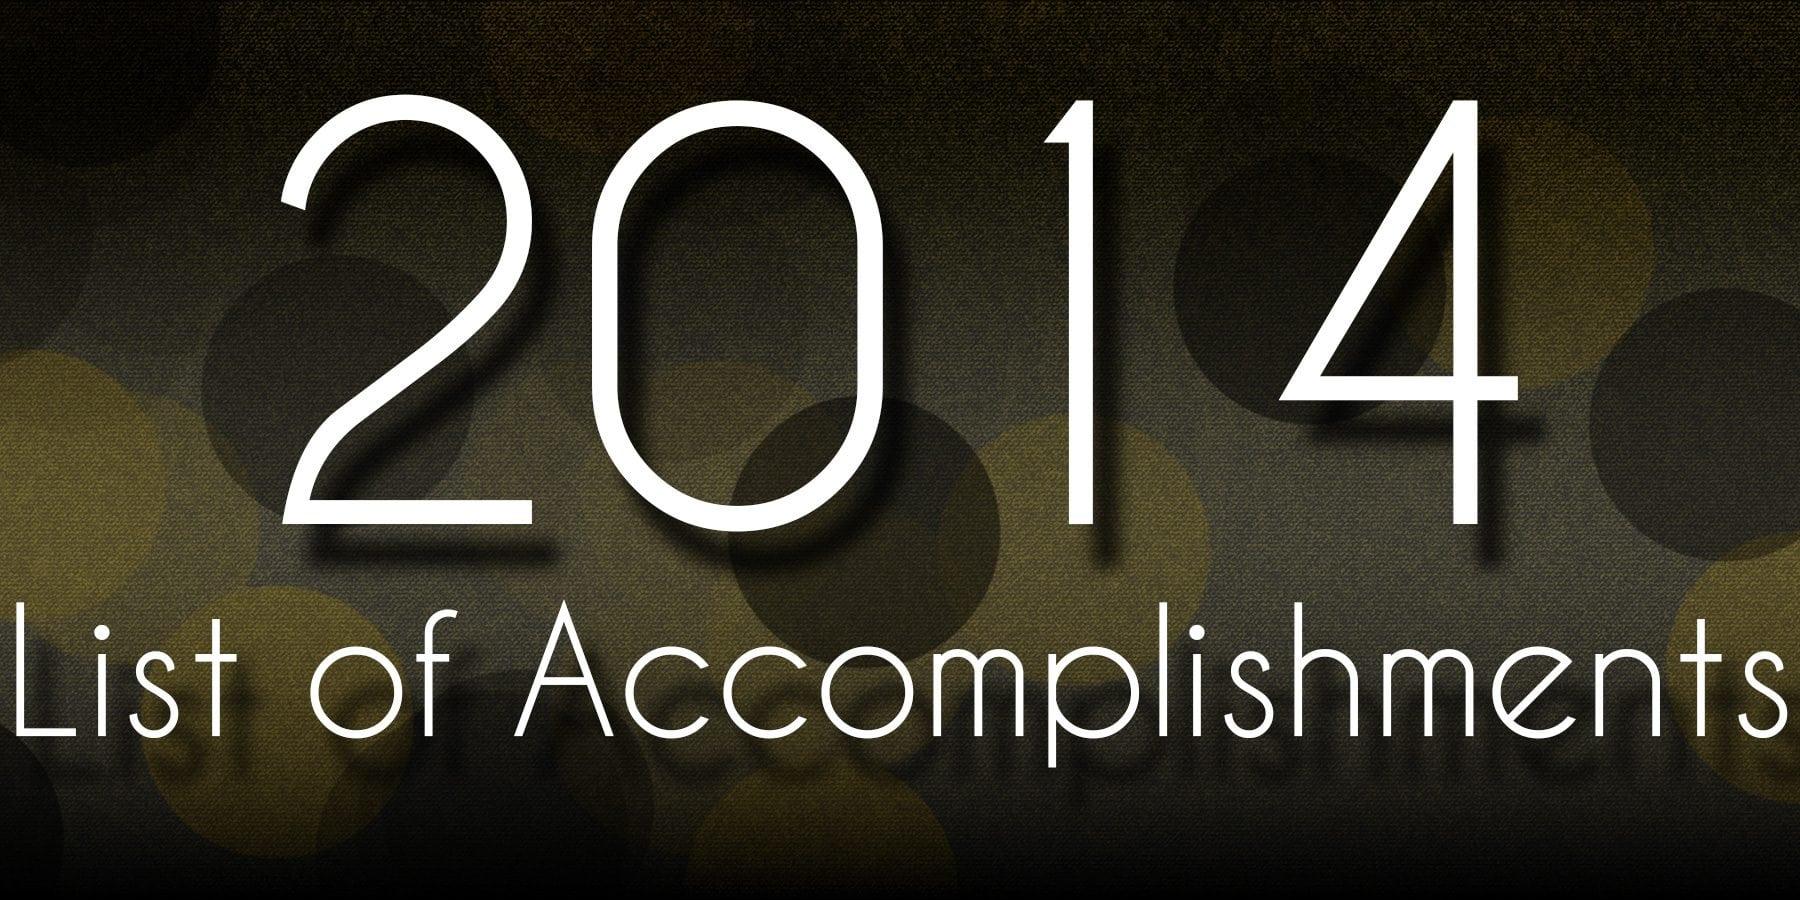 key accomplishments tk key accomplishments 23 04 2017